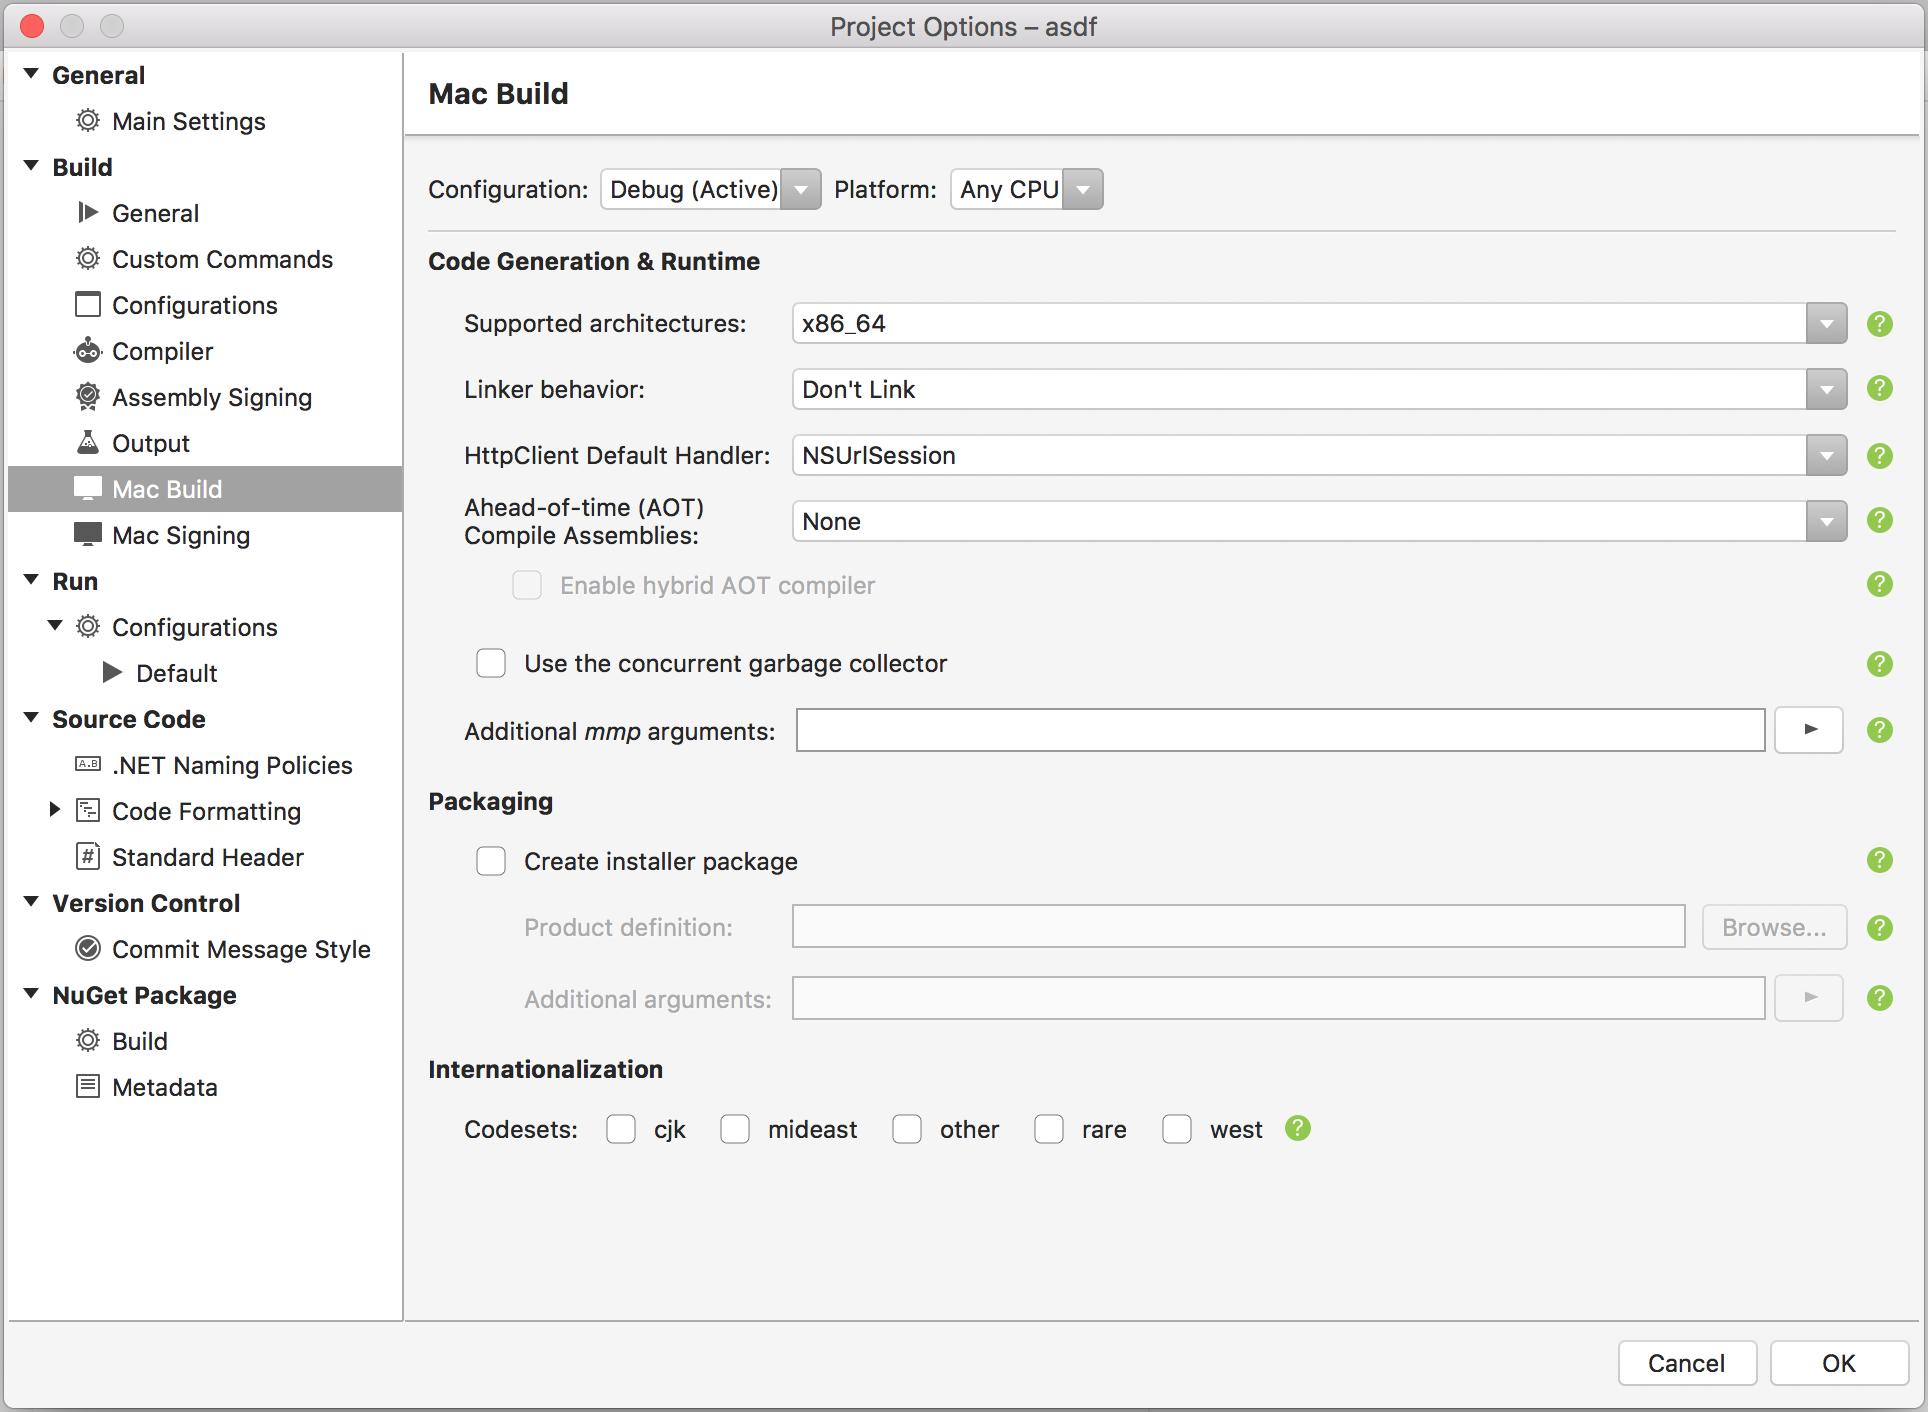 Transport Layer Security (TLS) 1 2 - Xamarin | Microsoft Docs